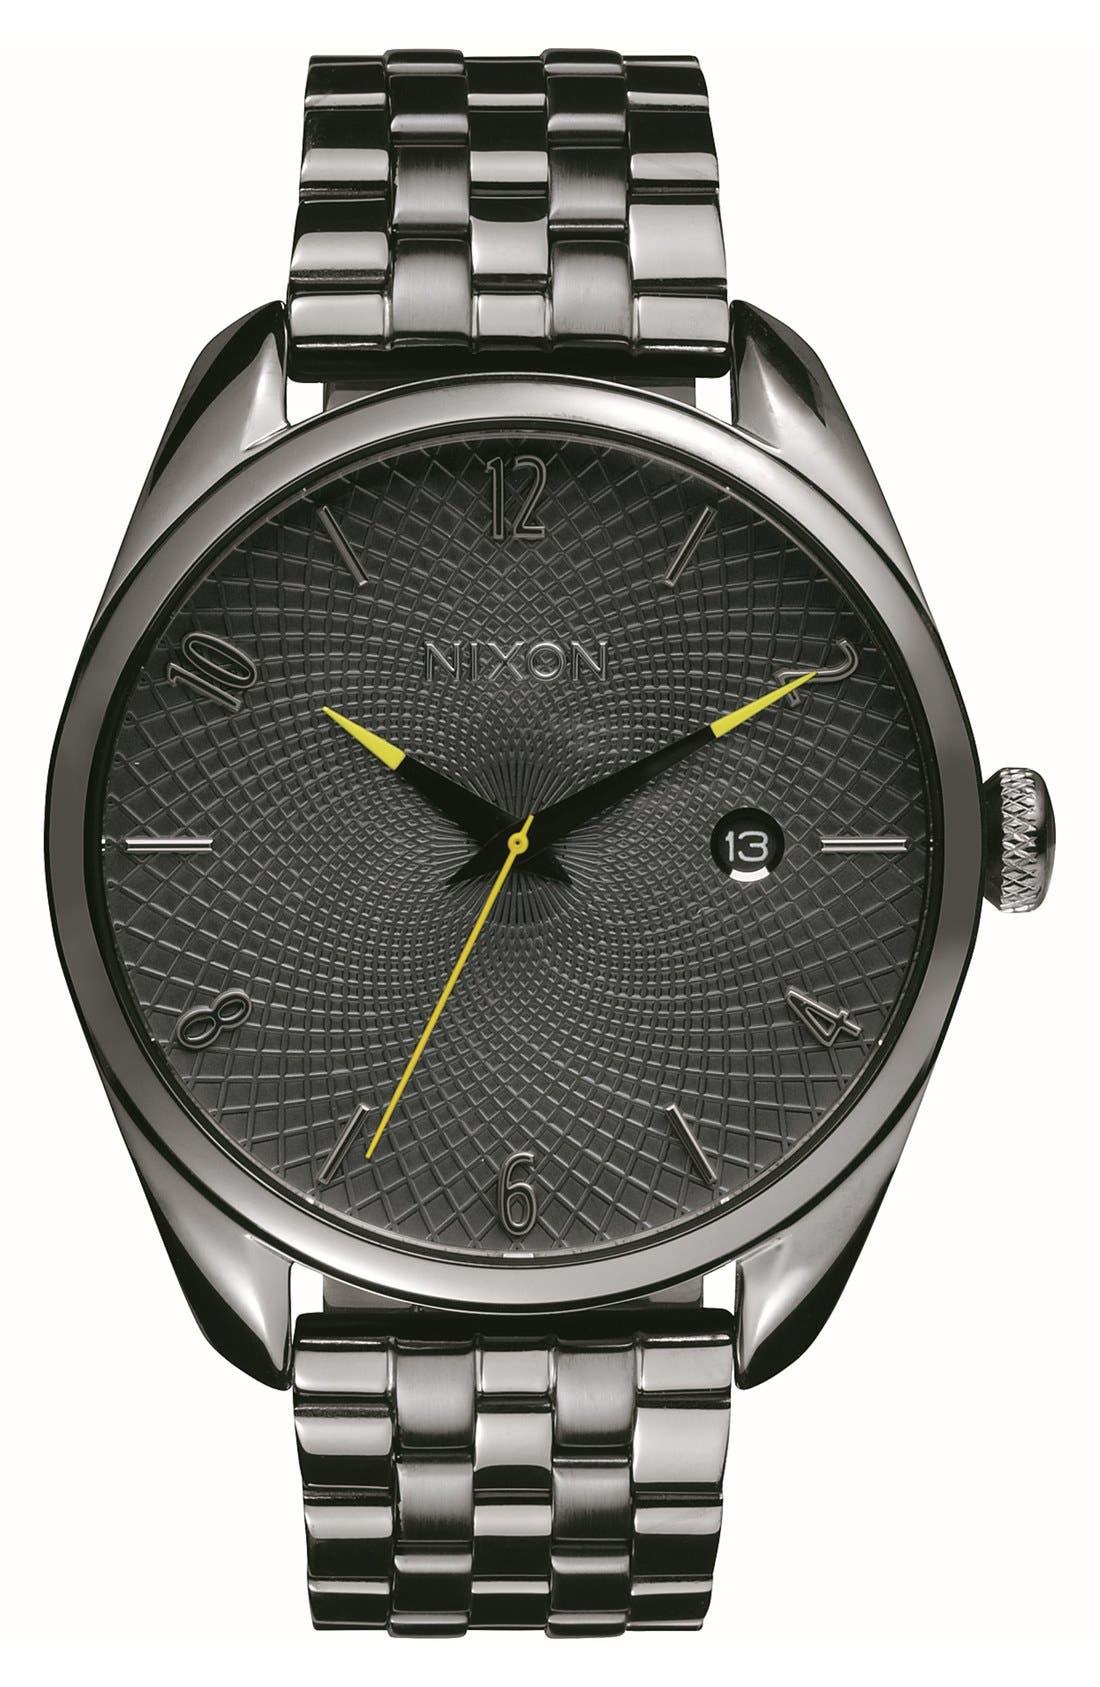 Main Image - Nixon 'Bullet' Guilloche Dial Bracelet Watch, 38mm